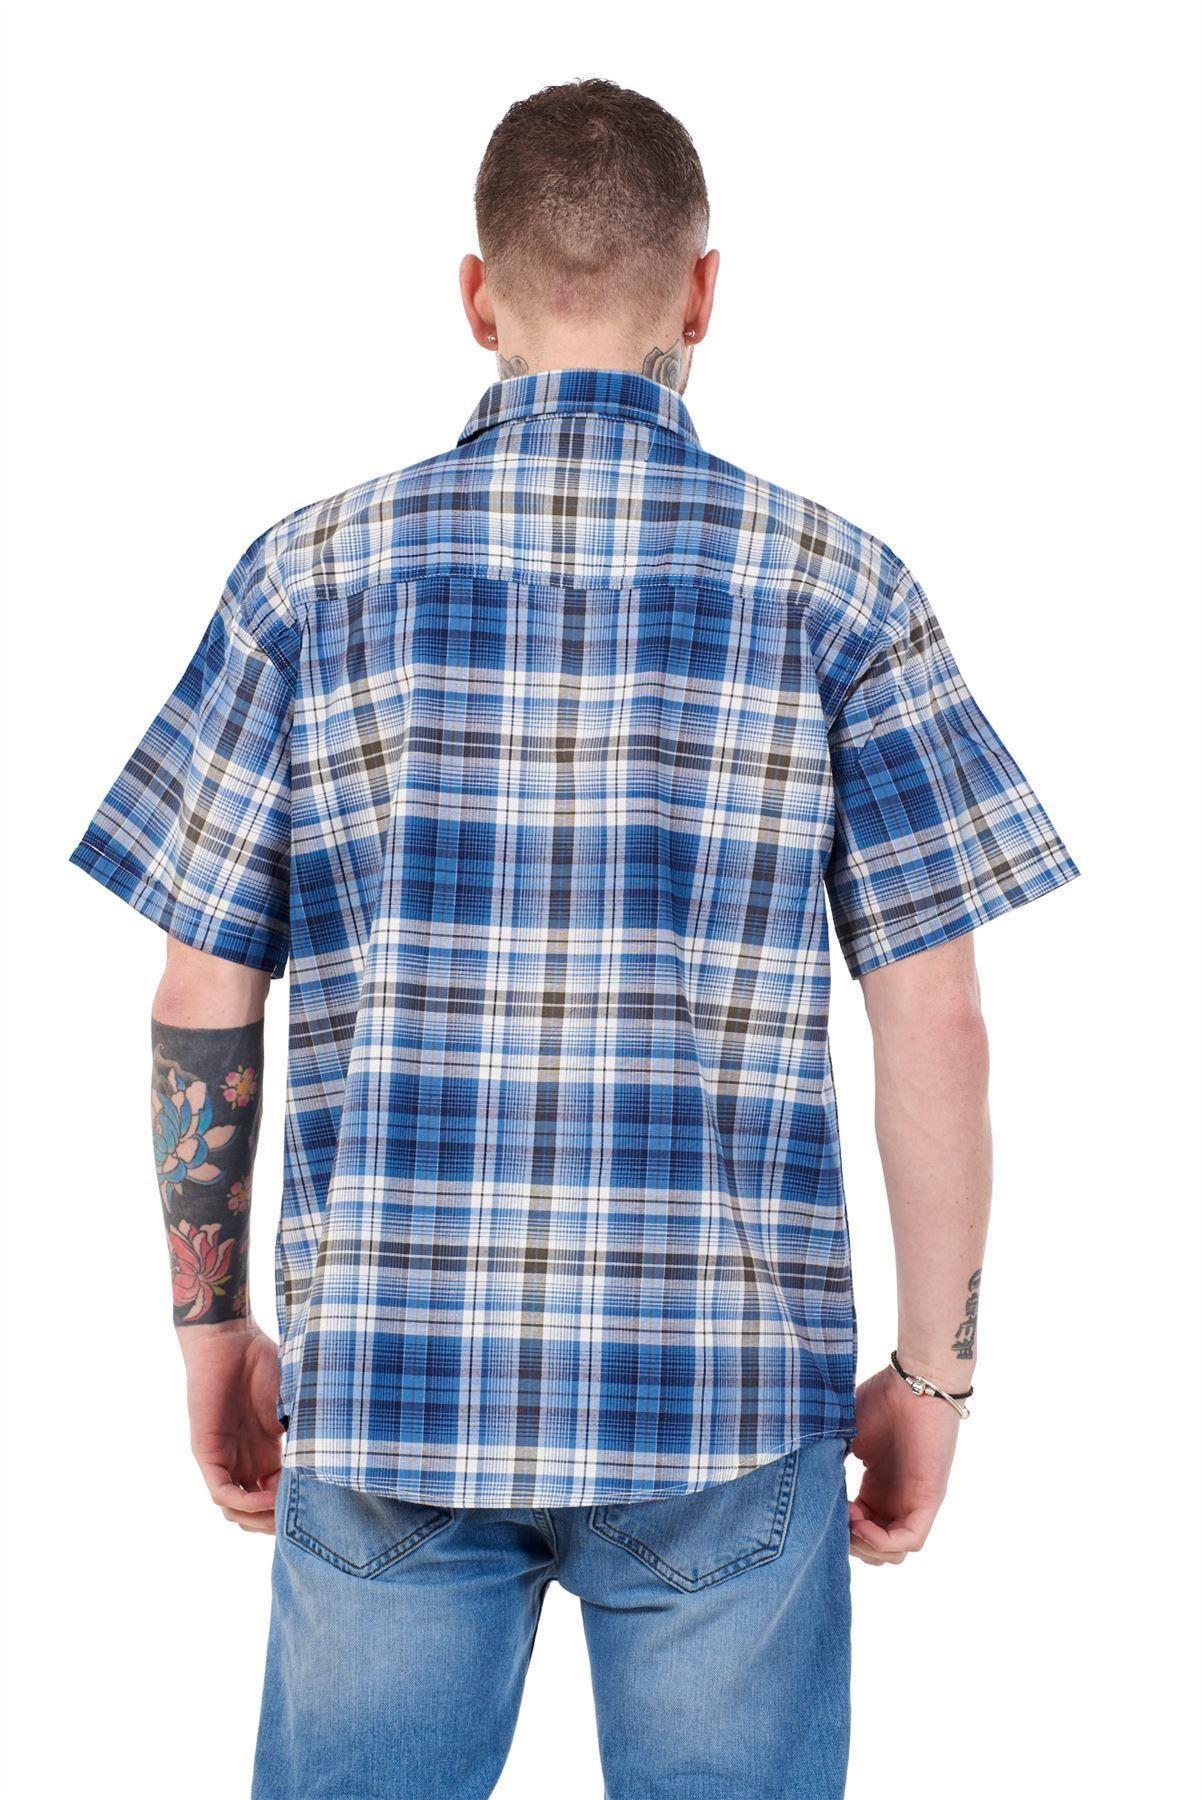 Mens-Regular-Big-Size-Shirts-Checked-Cotton-Blend-Casual-Short-Sleeve-Blue-M-5XL thumbnail 7